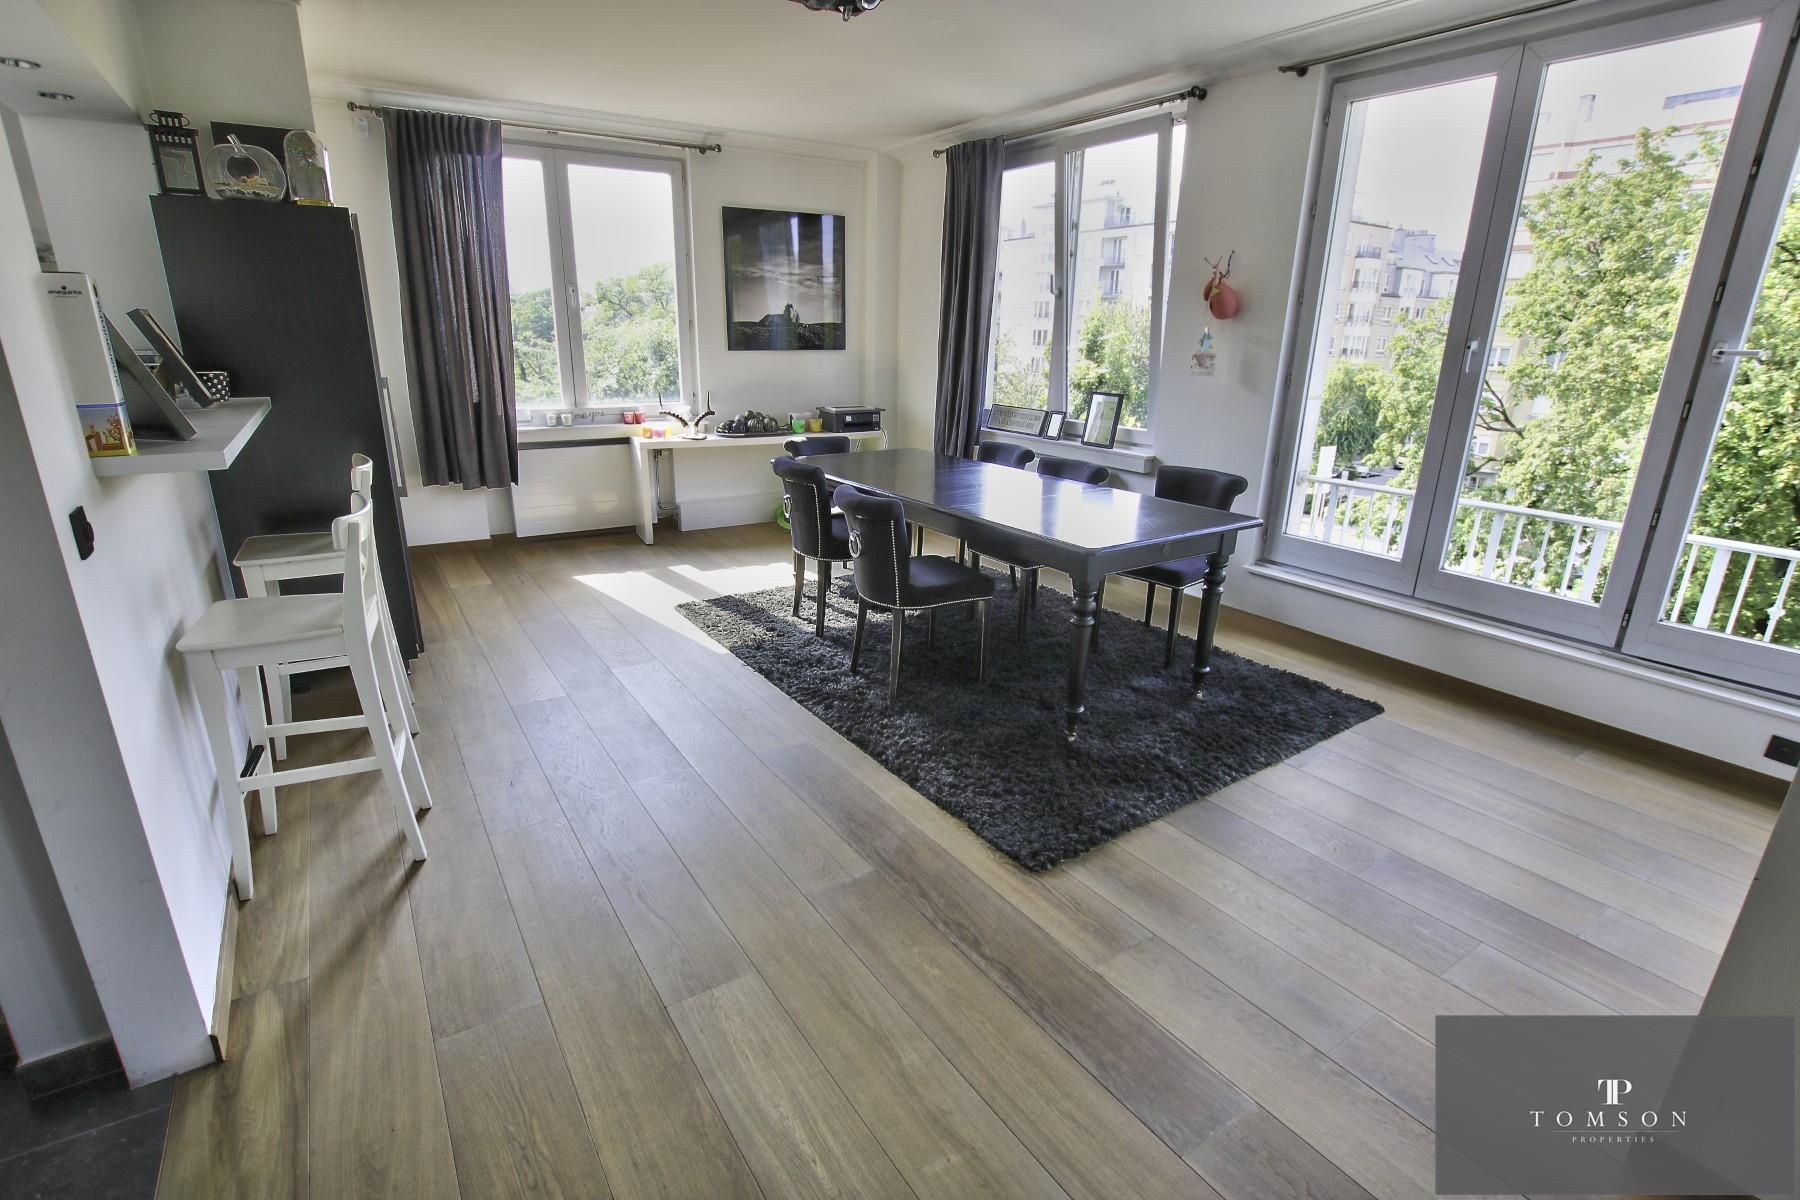 Flat - Etterbeek - #4134994-2